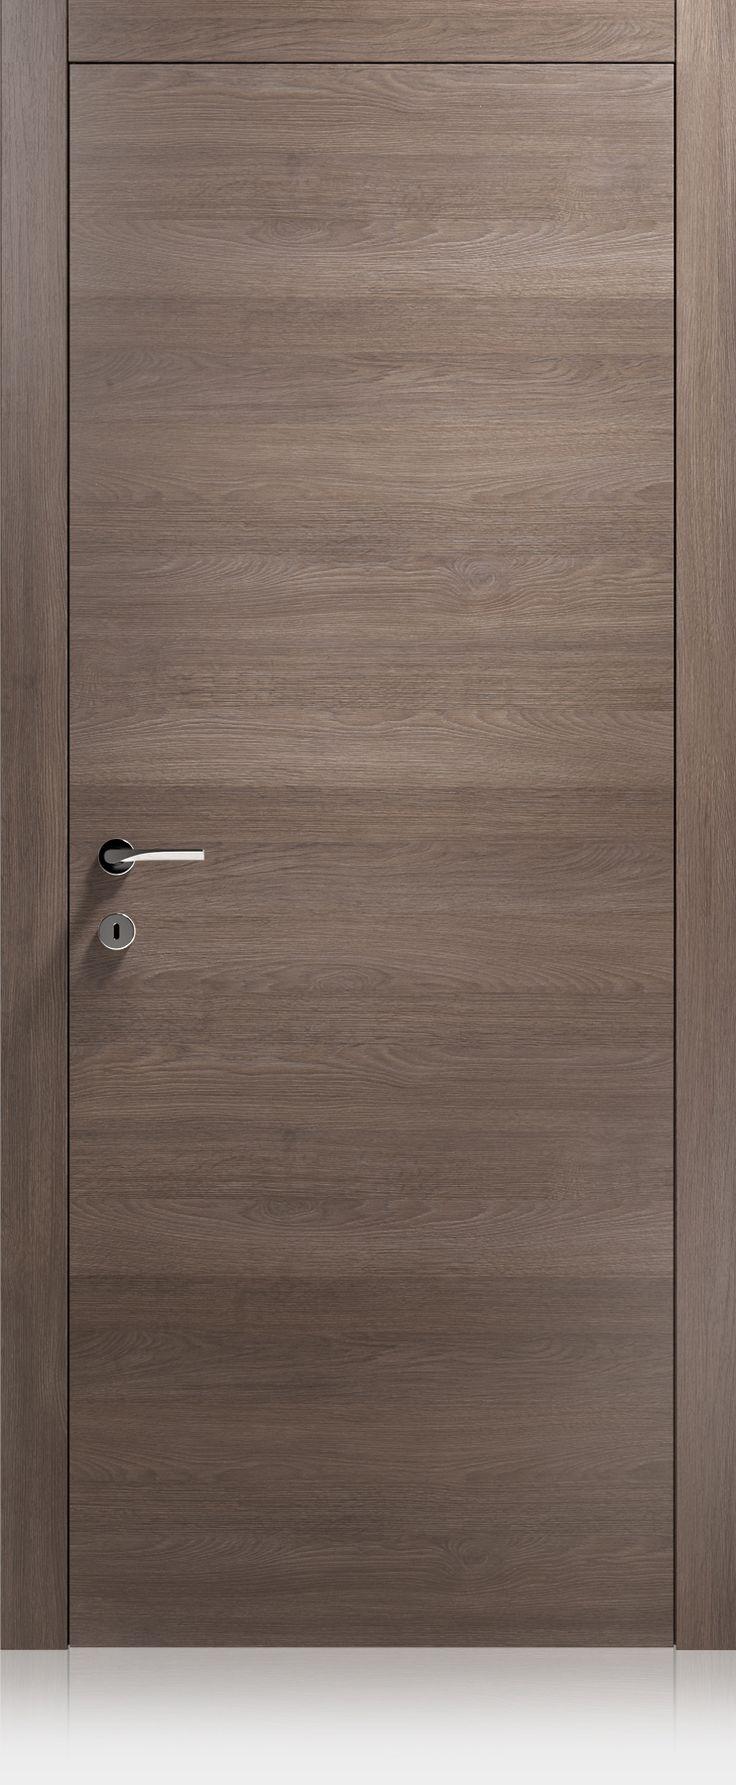 47 best doors windows porte finestre images on - Ferrero porte prezzi ...